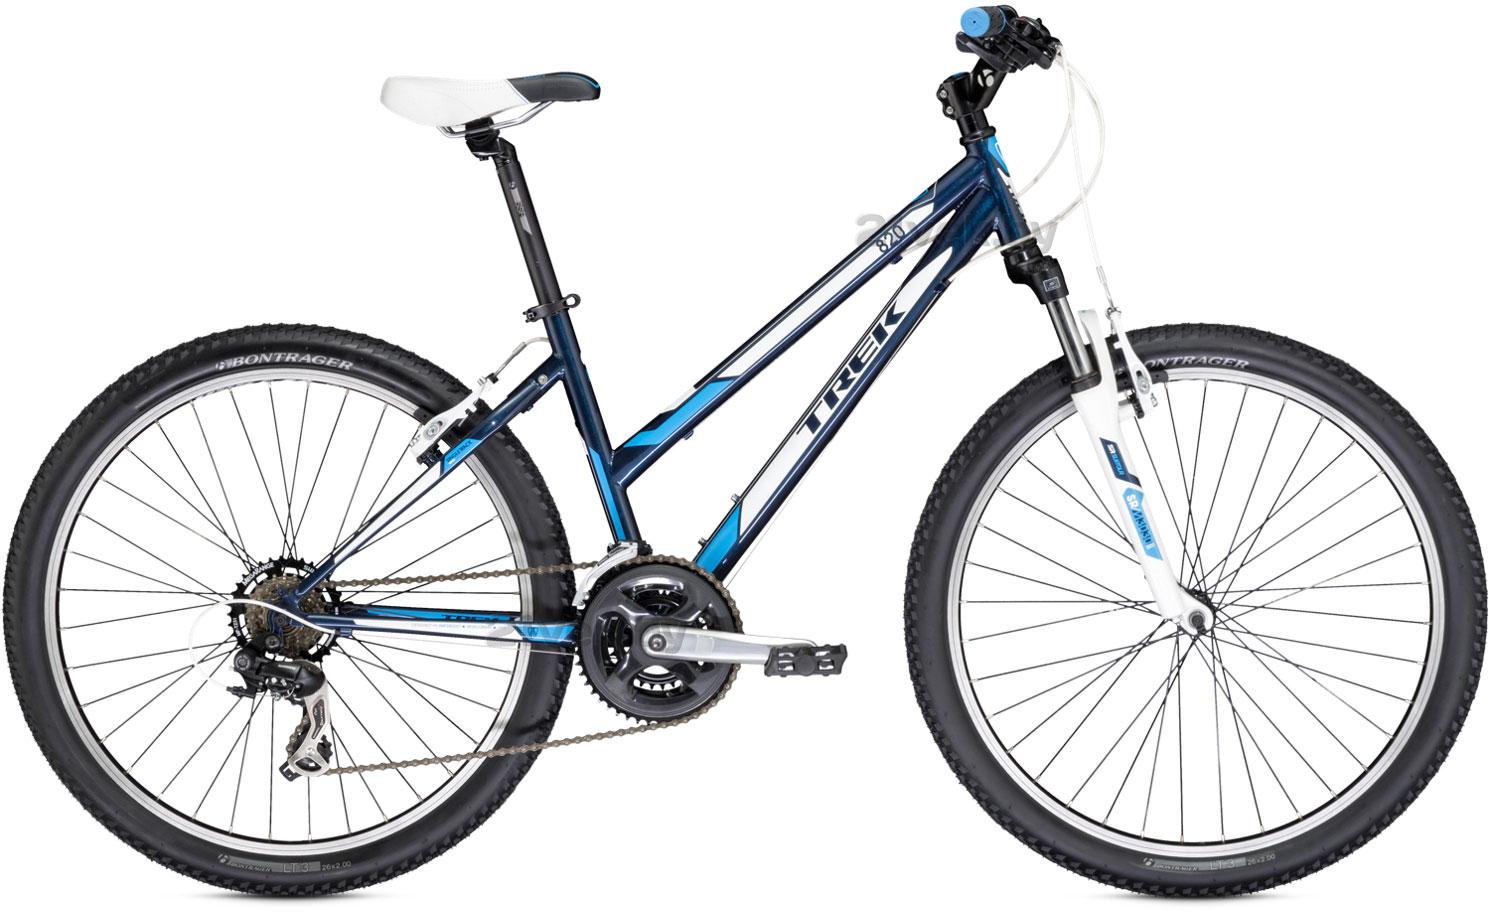 820 WSD (16L, Blue, 2014) 21vek.by 3468000.000